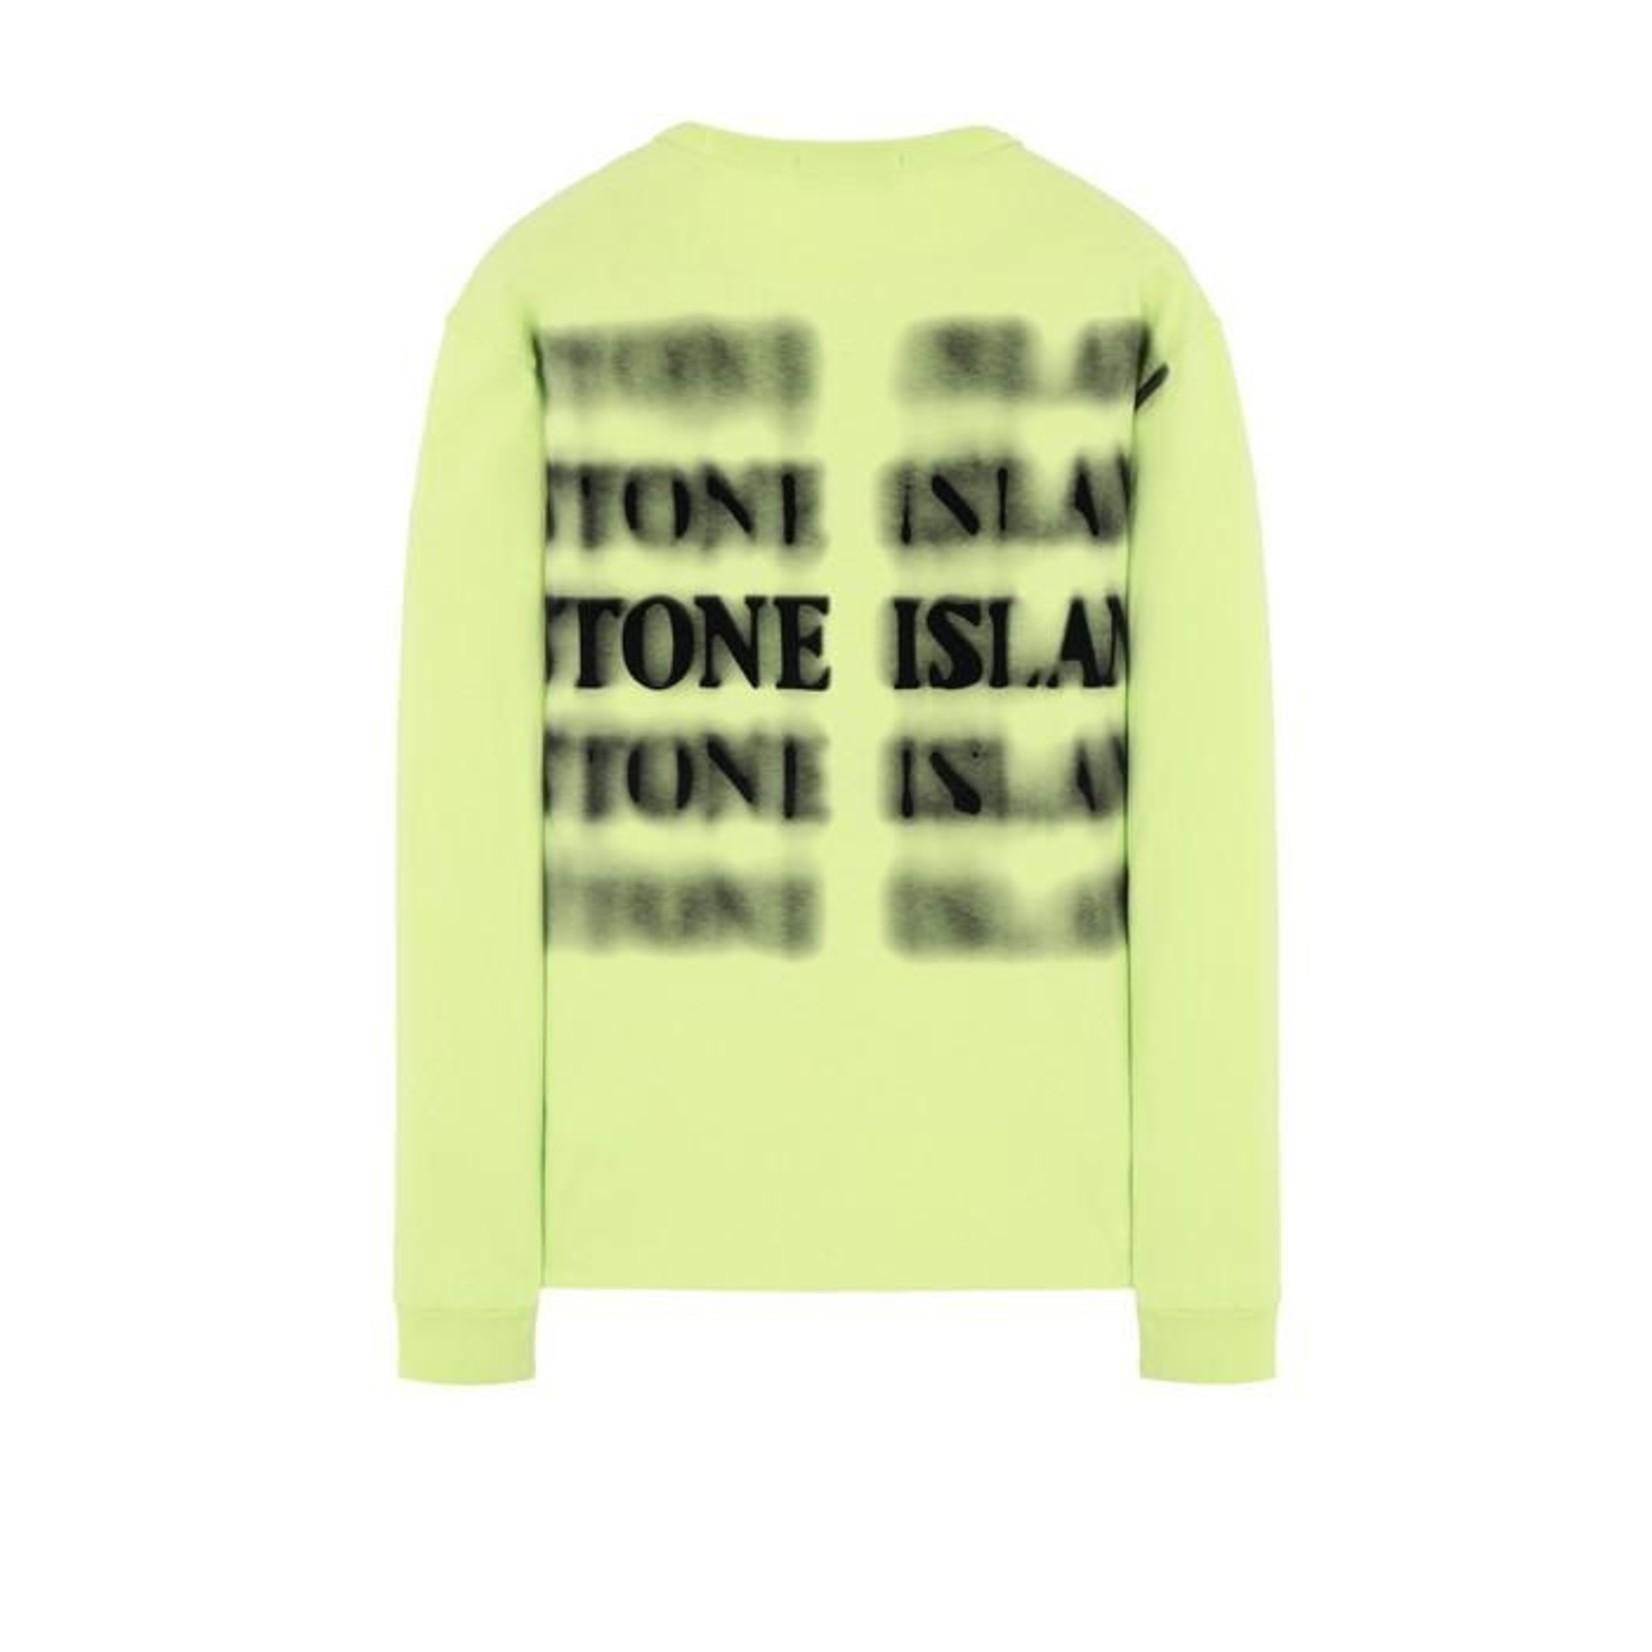 Stone Island Neon Long Sleeve Tee